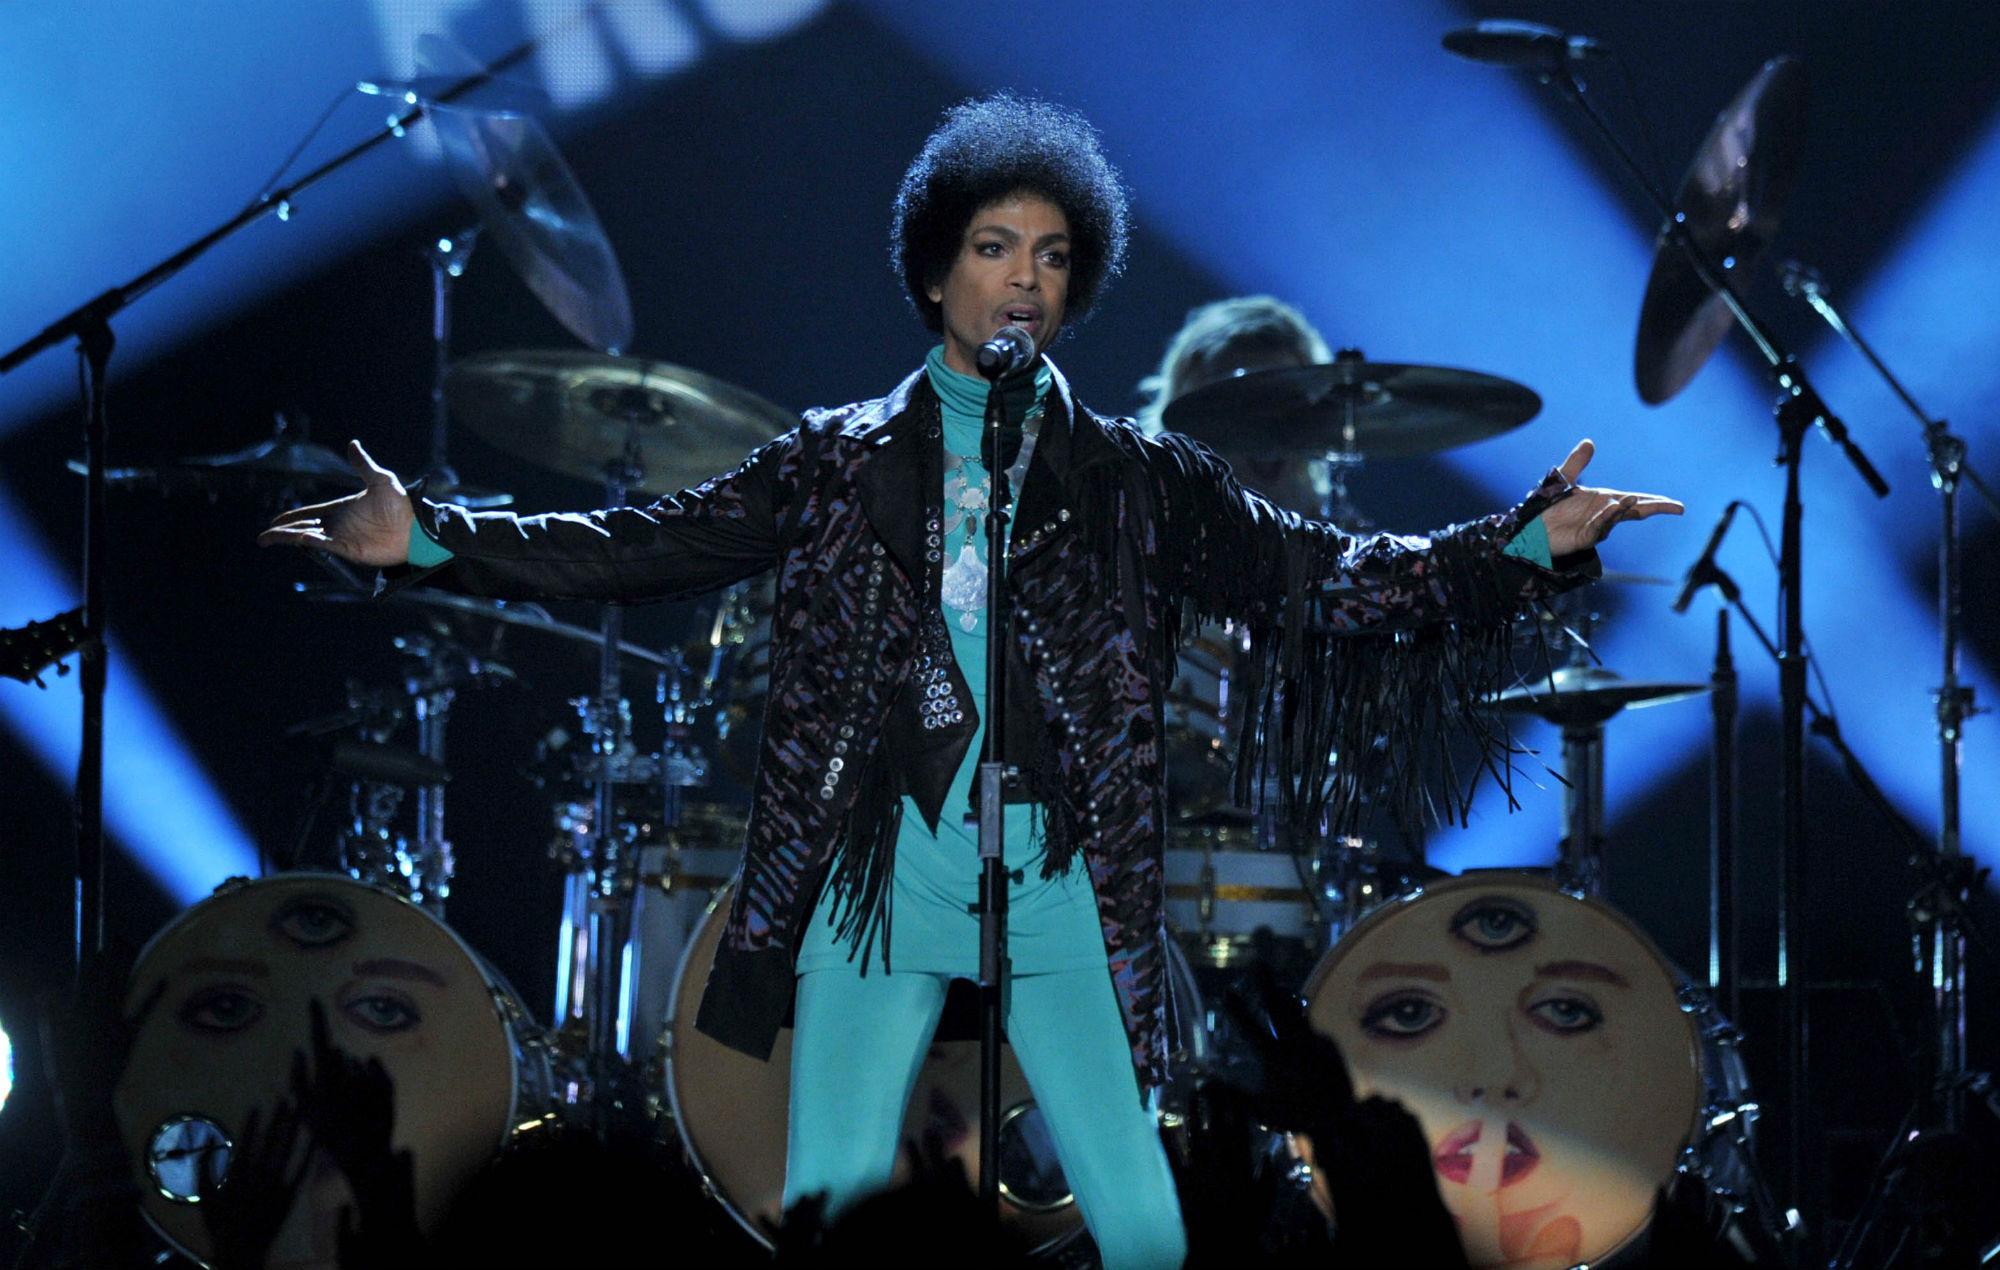 Prince's estate to release 'Originals' album of unreleased demos